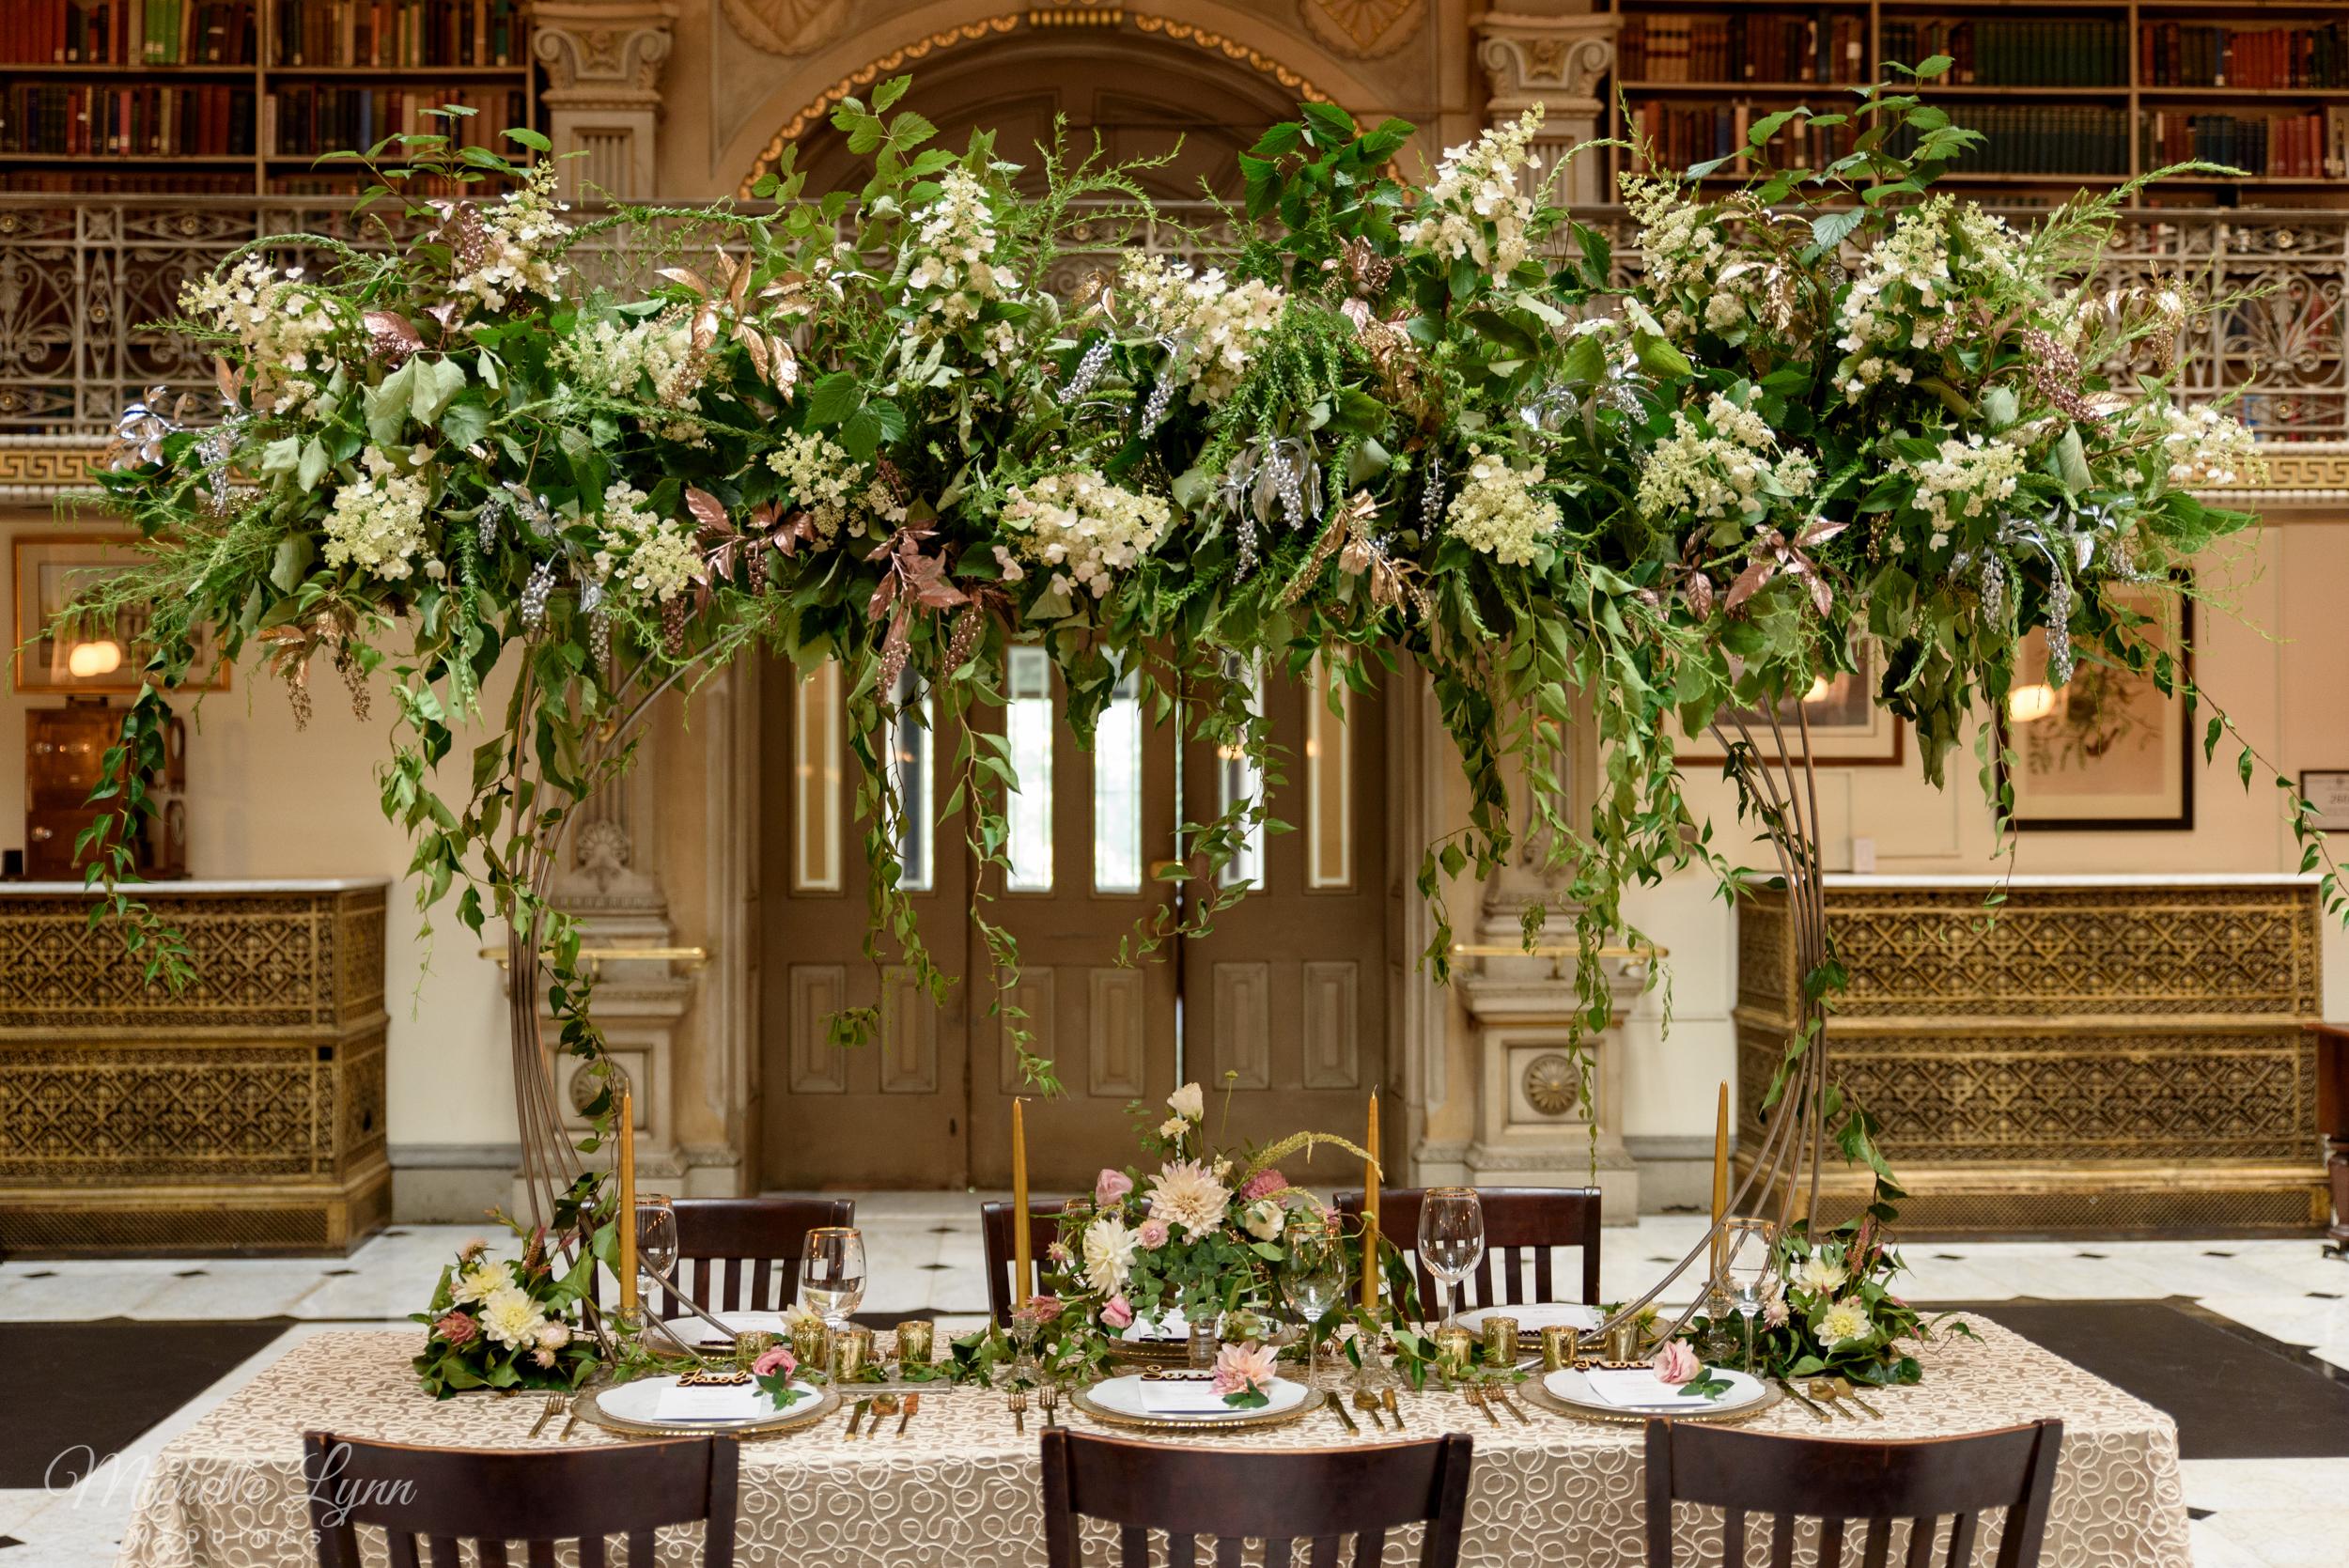 George_Peabody_Library-Wedding_Styled_Shoot-28.jpg